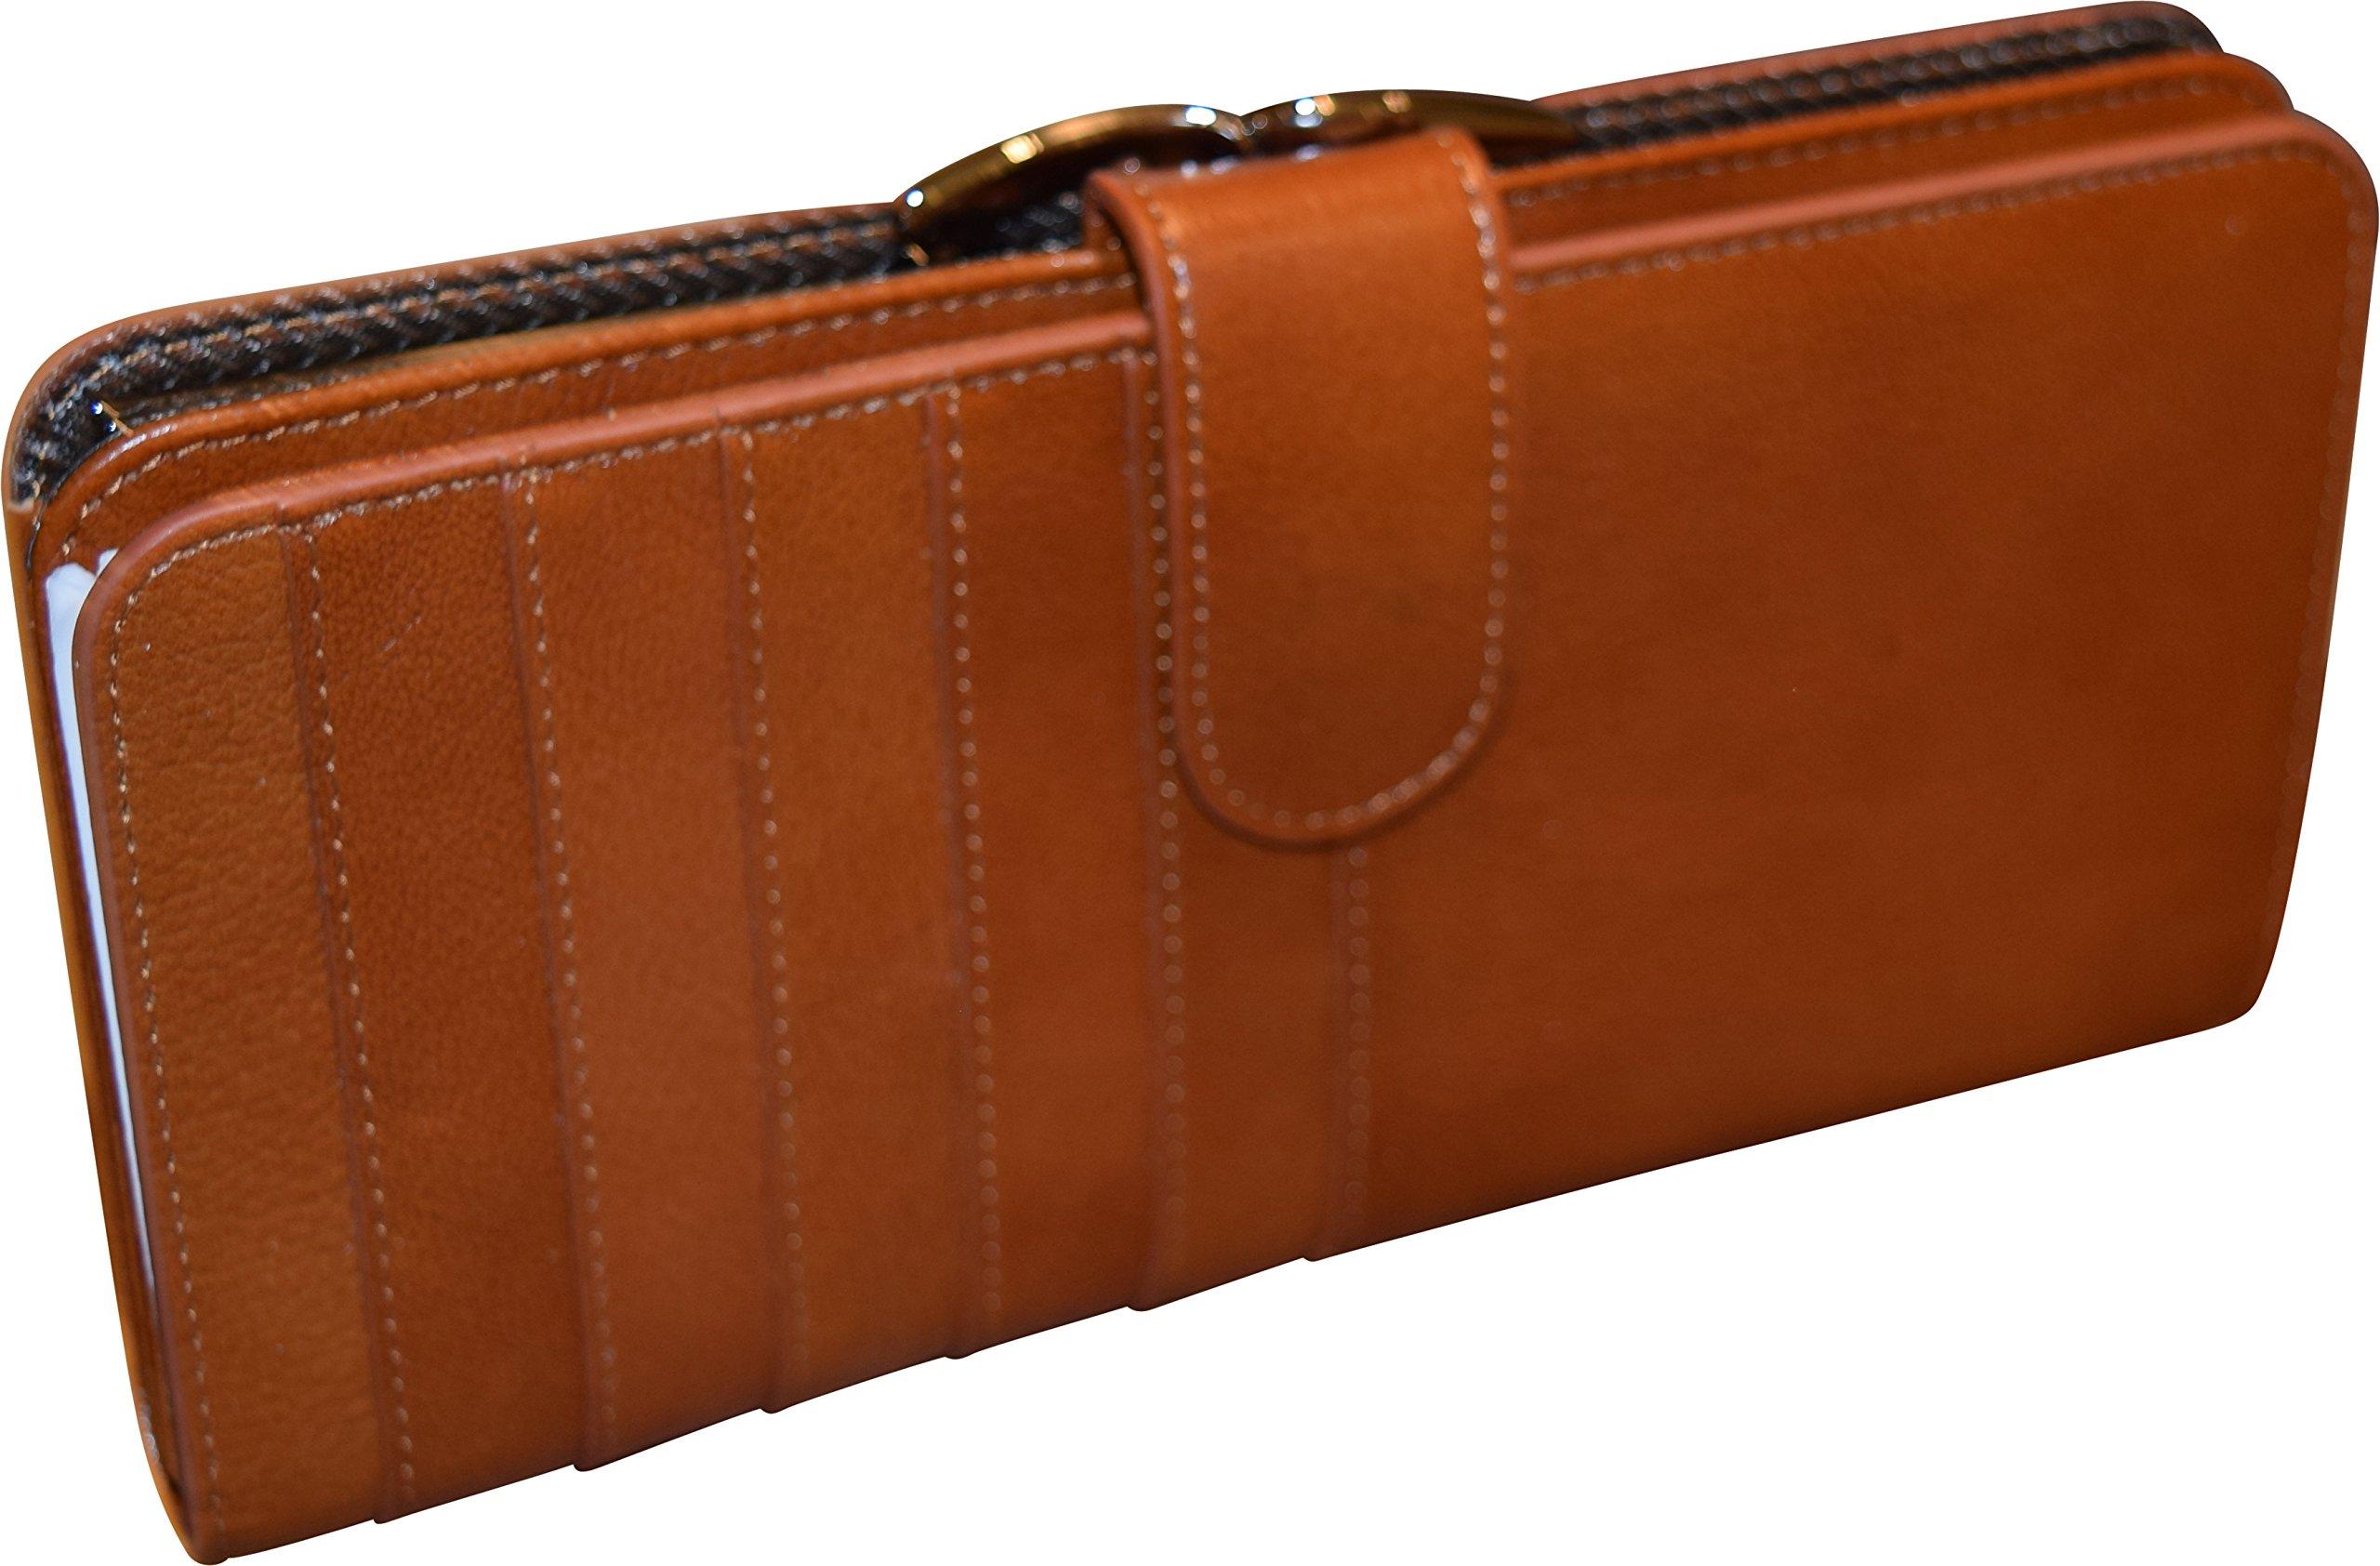 Genuine Top Grain Leather Women's Flap Wallet - Credit Card Clutch (Tan W/ Frame)